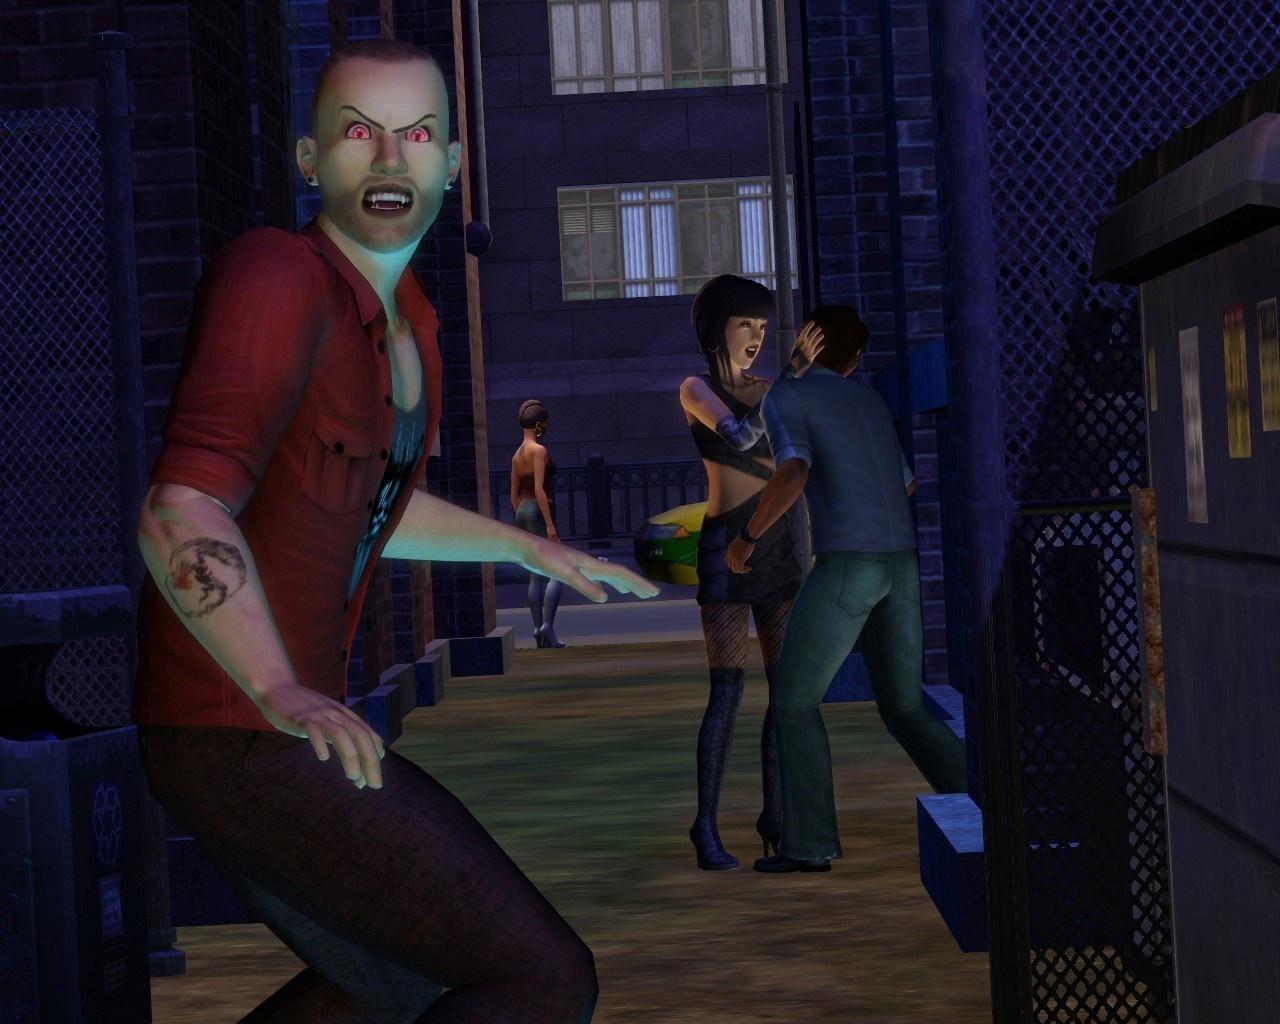 vampire-les-sims-3-acces-vip.